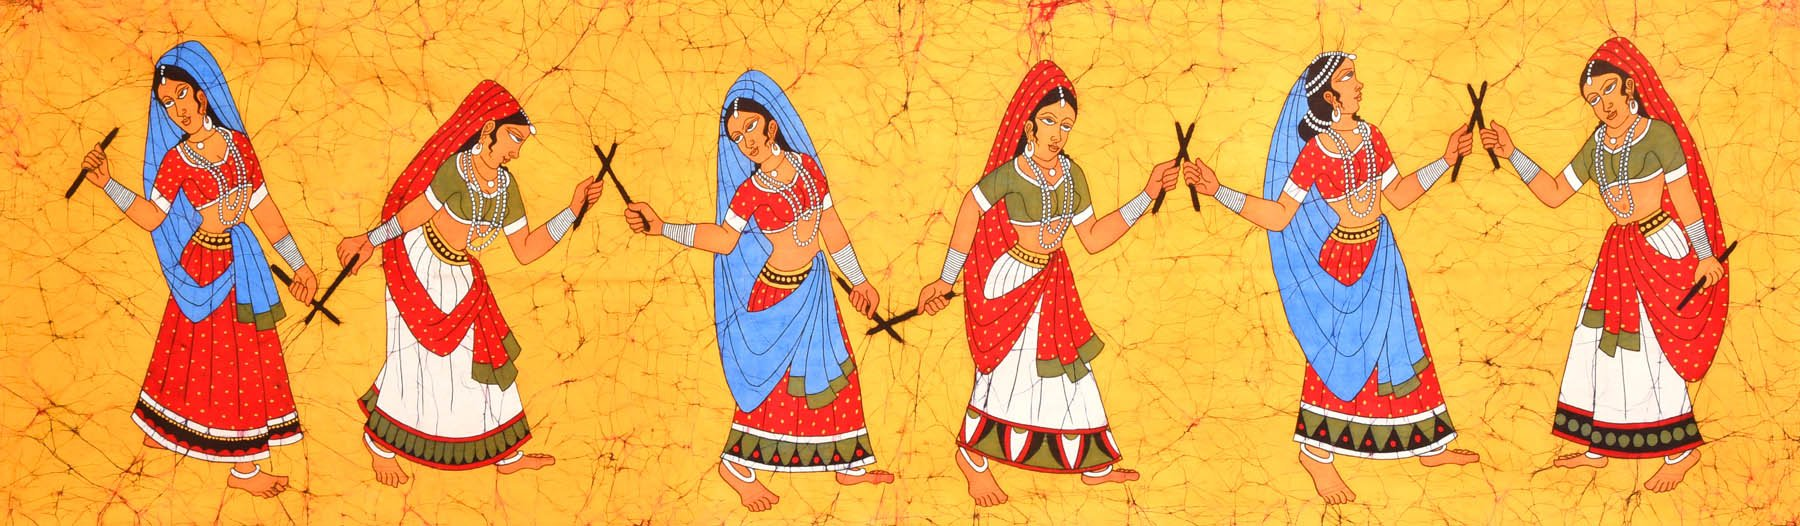 Dandia Raas Folk Dance